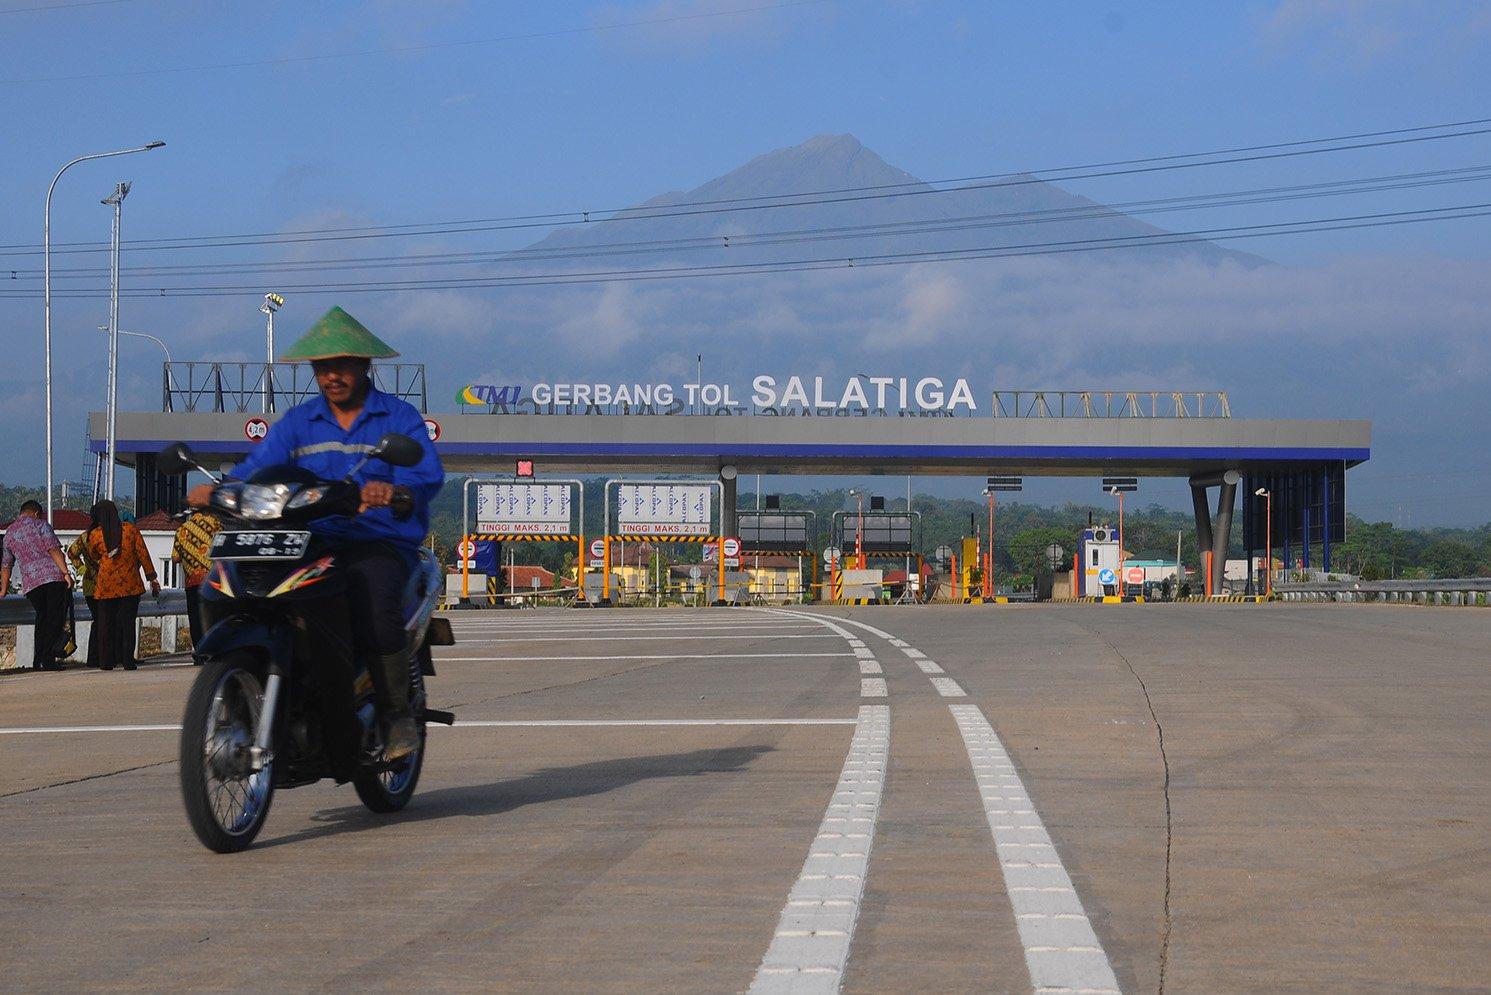 Gerbang tol Salatiga yang berlatar belakang Gunung Merbabu di Tingkir, Salatiga, Jawa Tengah, Kamis (8/6). Gerbang tol ini menjadi poros keluar dan masuk kendaraan dari Salatiga-Bawen.